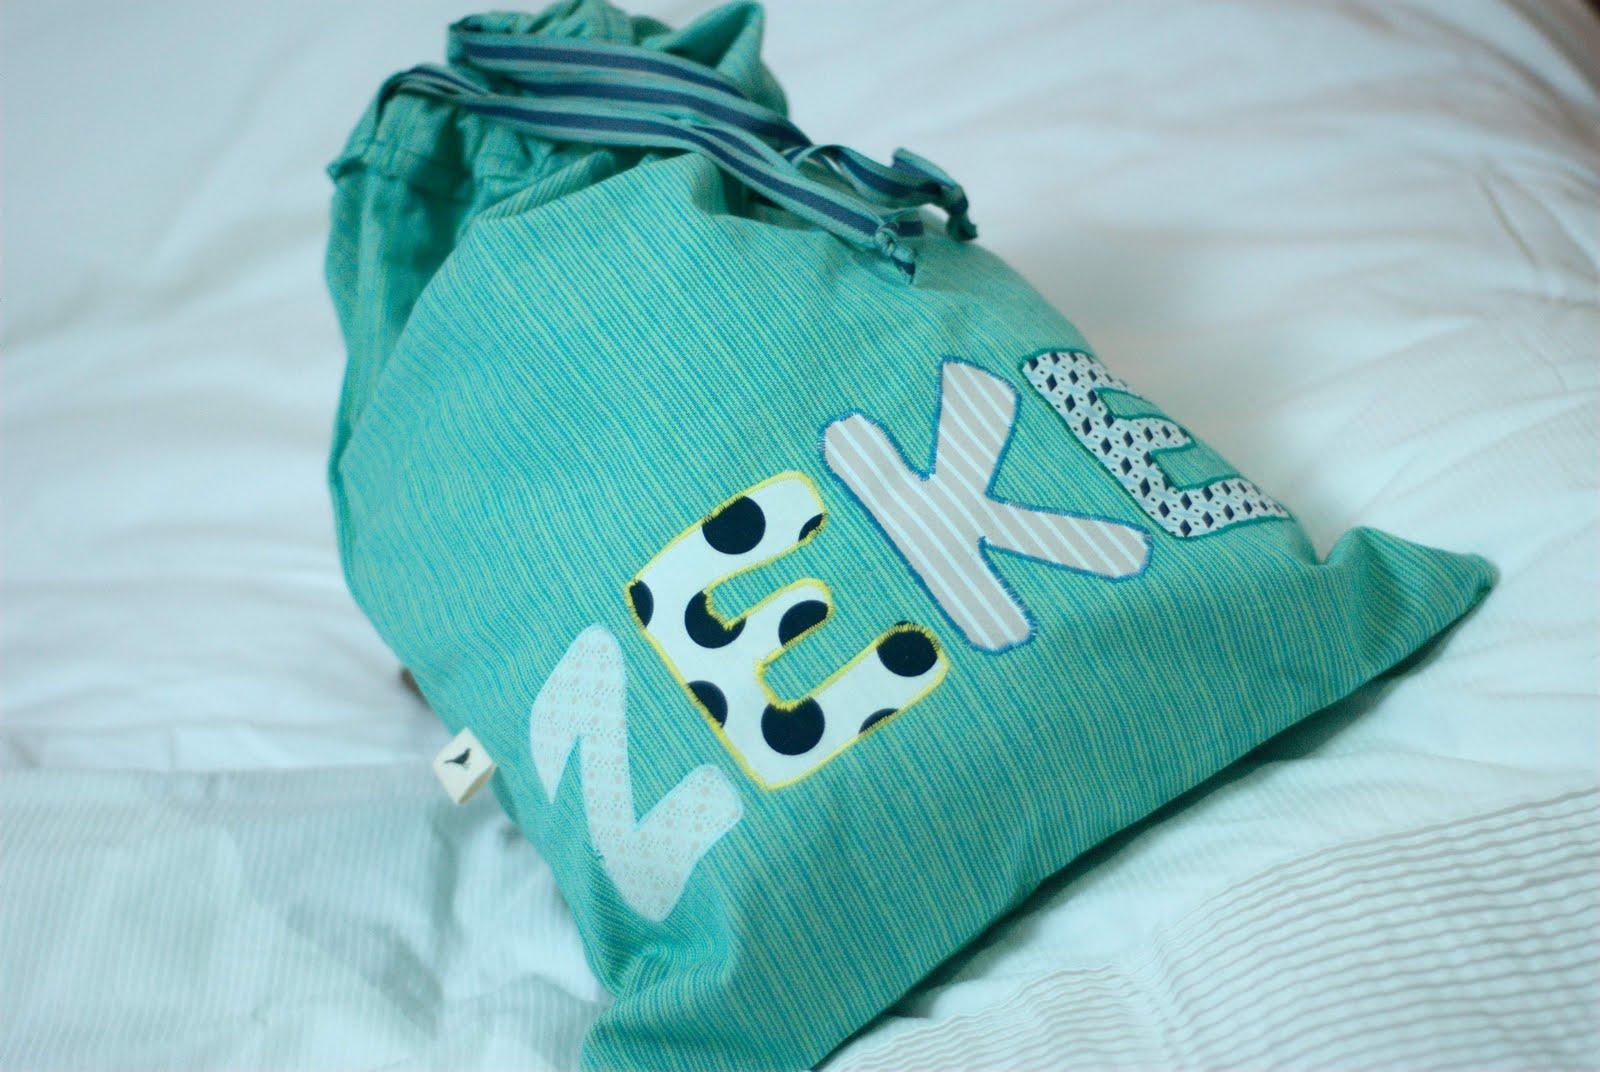 a drawstring bag